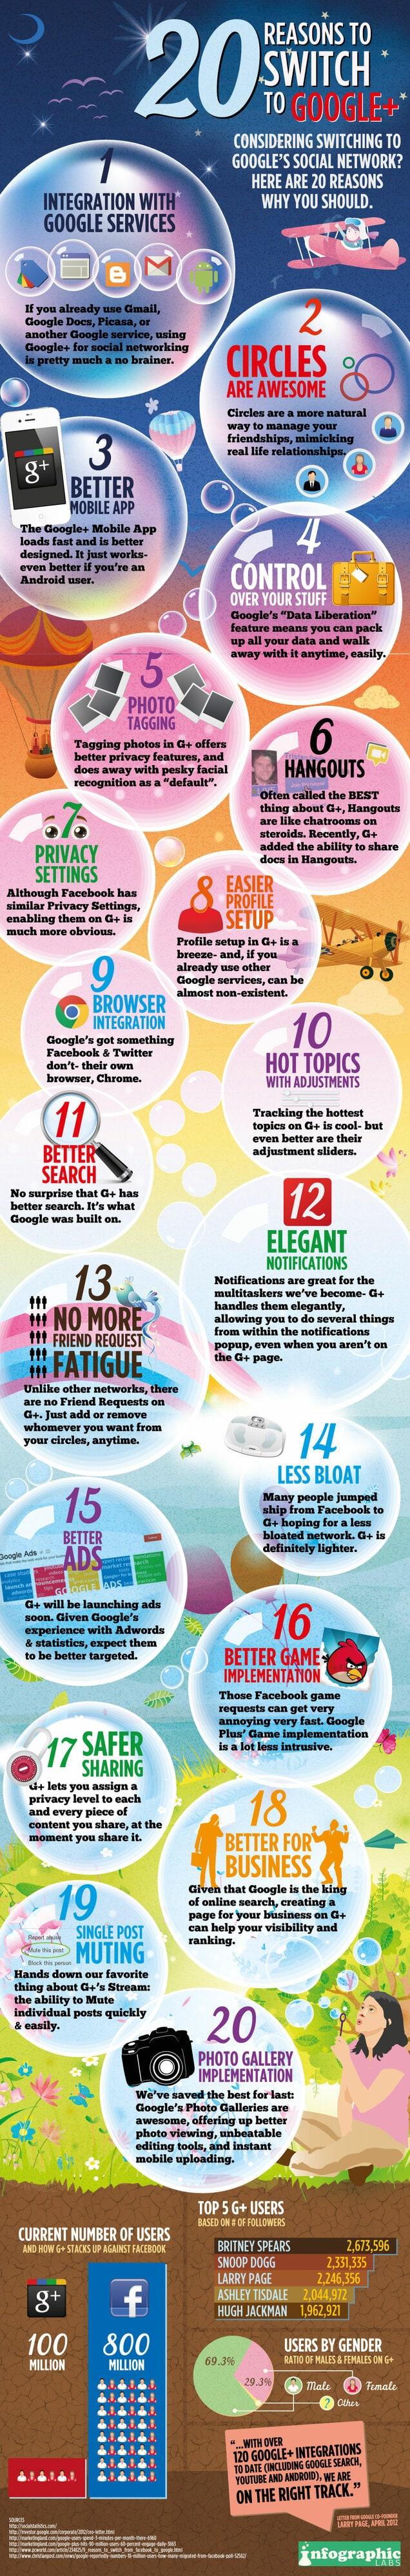 Google Plus Infographic - 20 Questions